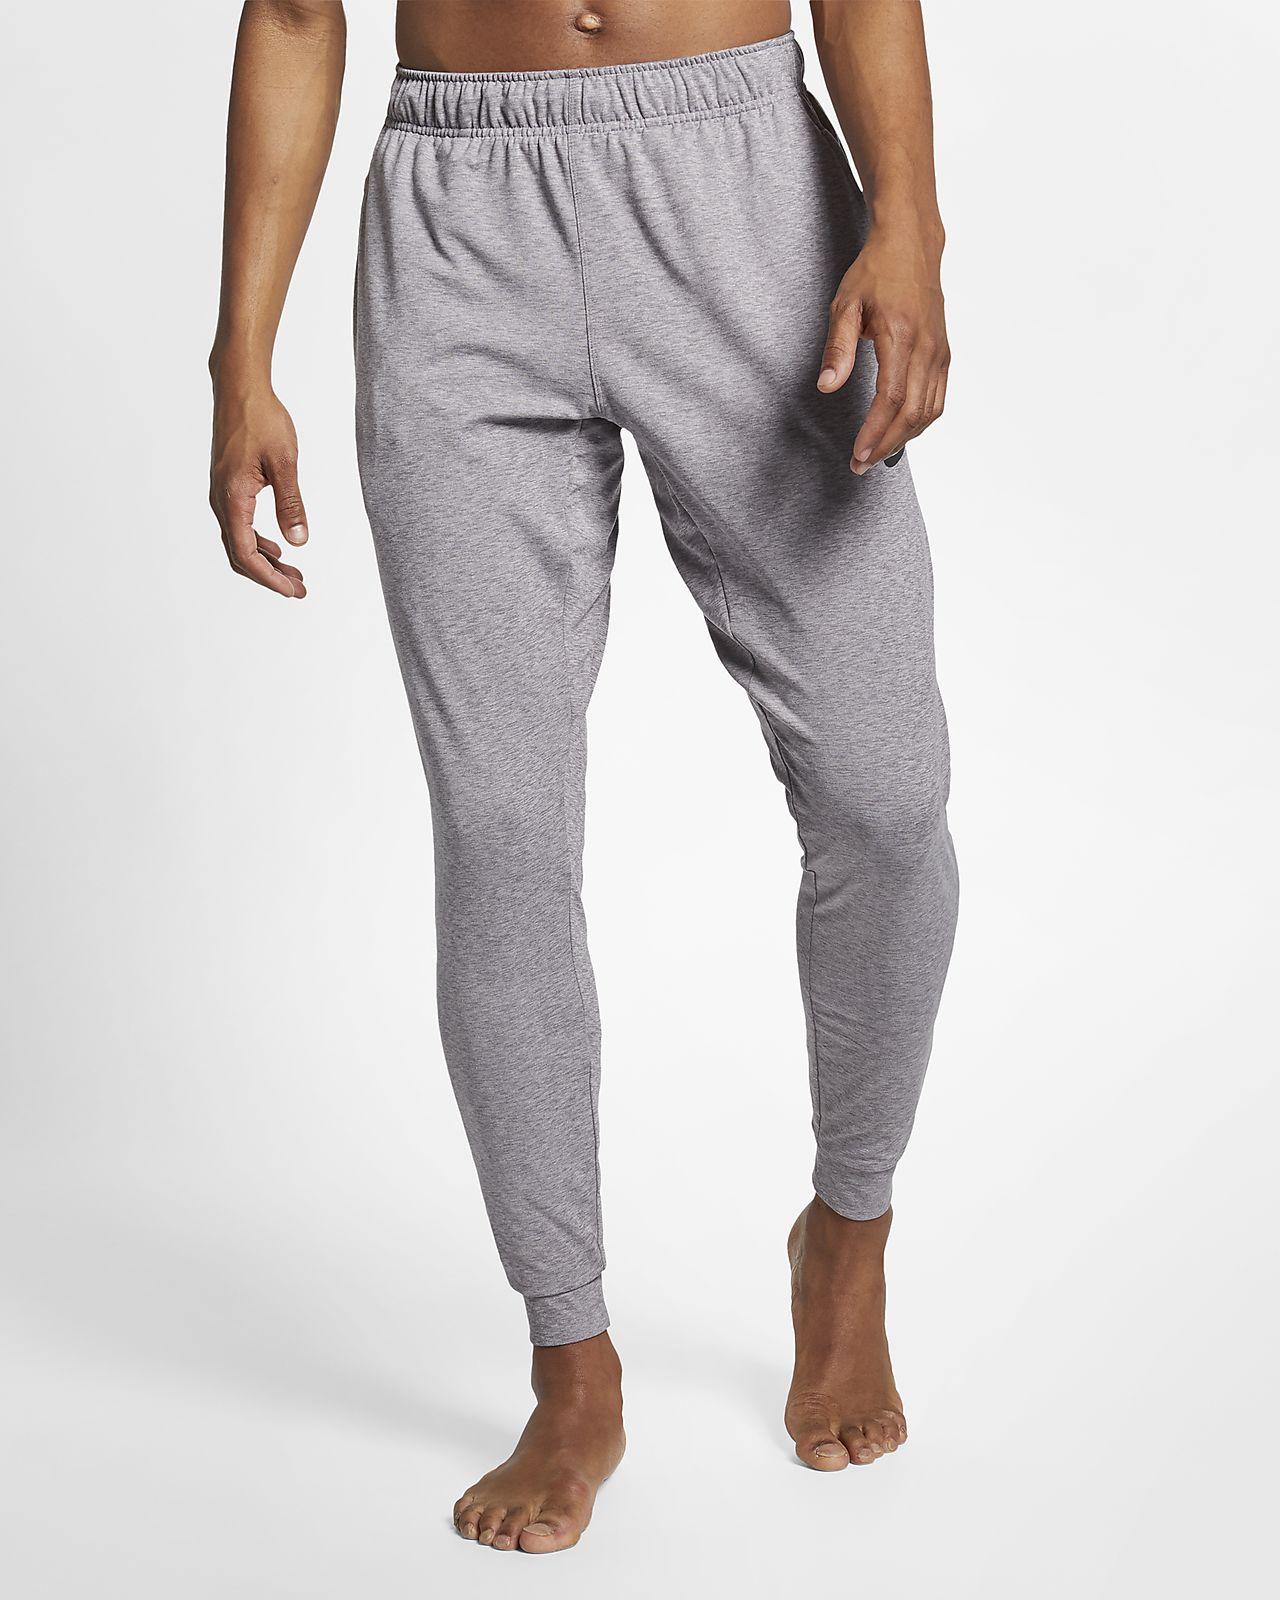 Pantaloni da yoga Nike Dri-FIT - Uomo